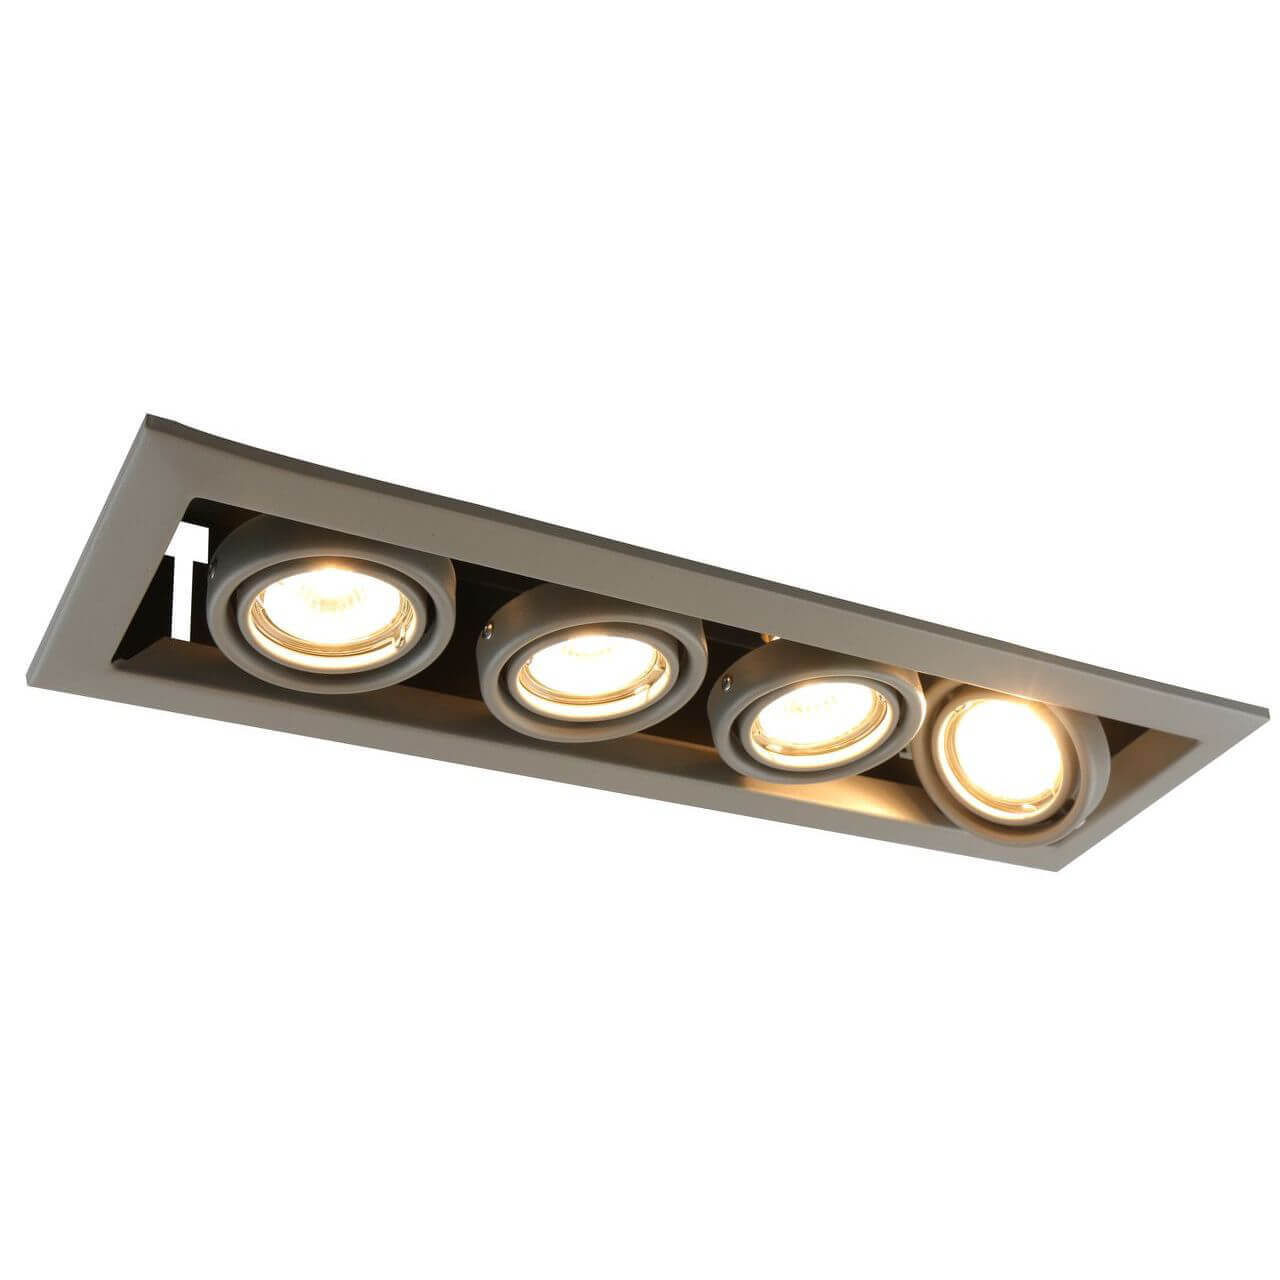 Встраиваемый светильник Arte Lamp Cardani Piccolo A5941PL-4GY arte lamp встраиваемый светильник arte lamp cardani silver a5941pl 4si